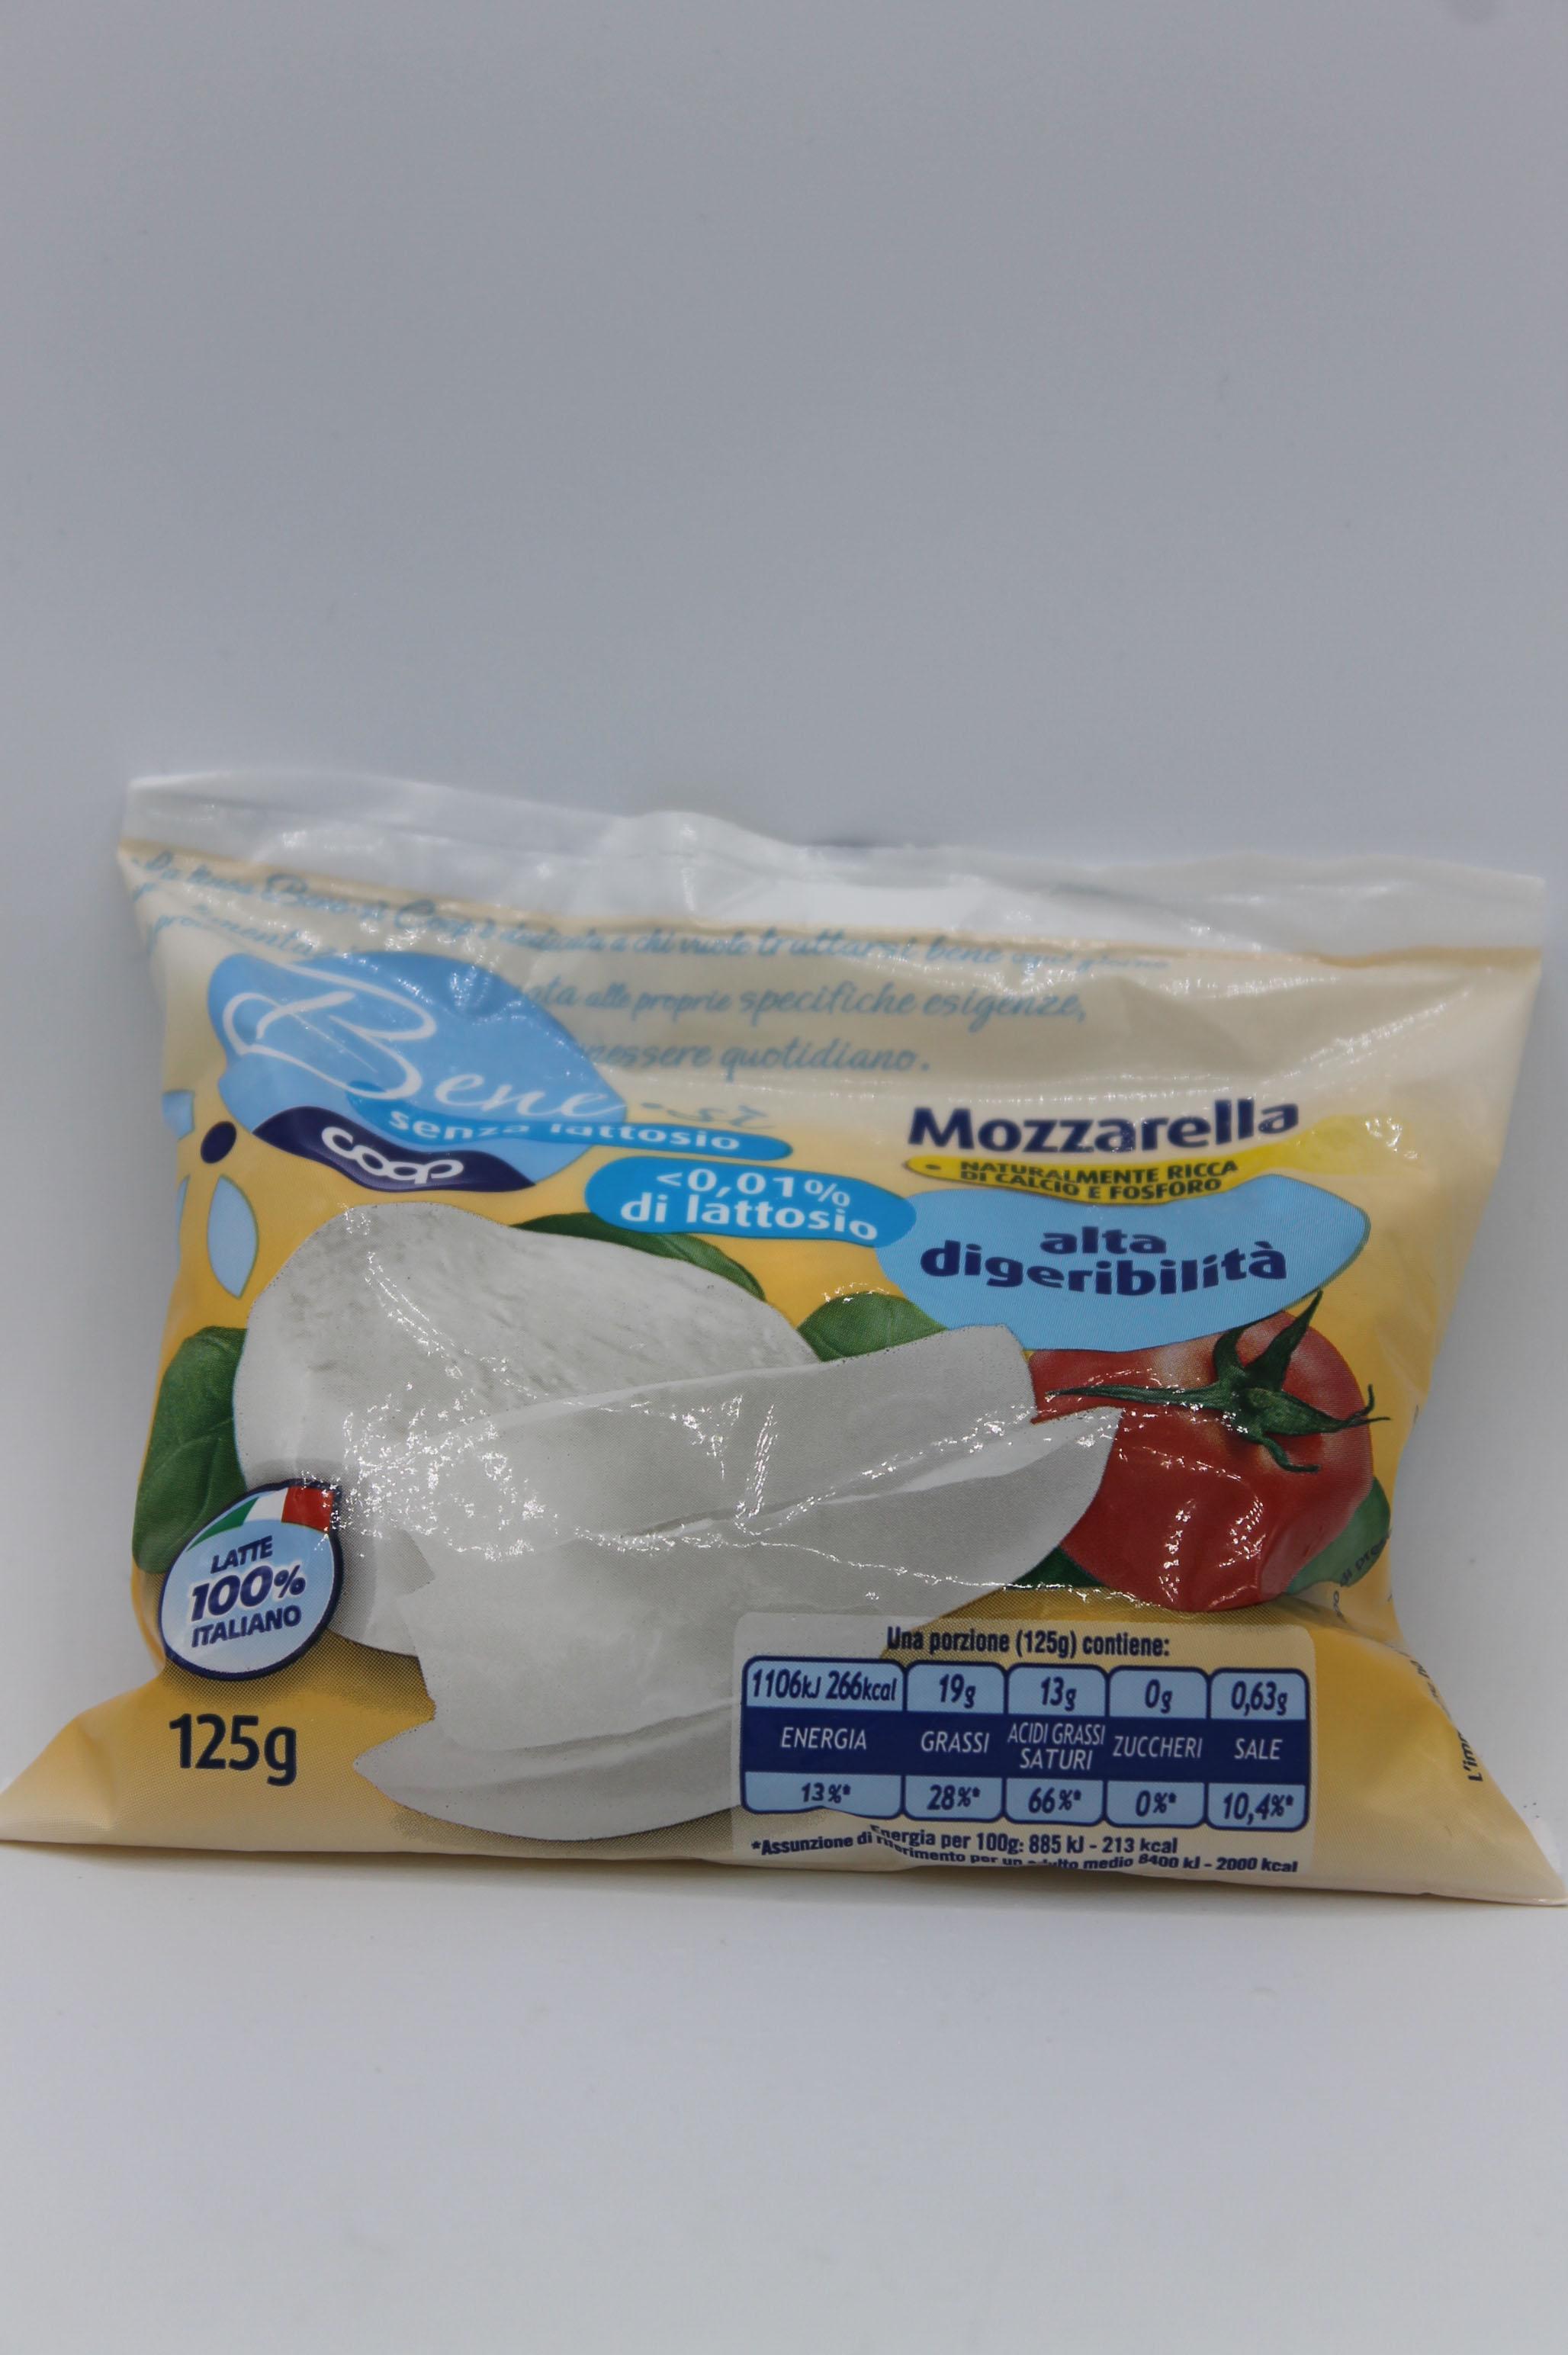 Coop benesì mozzarella senza lattosio 125gr.